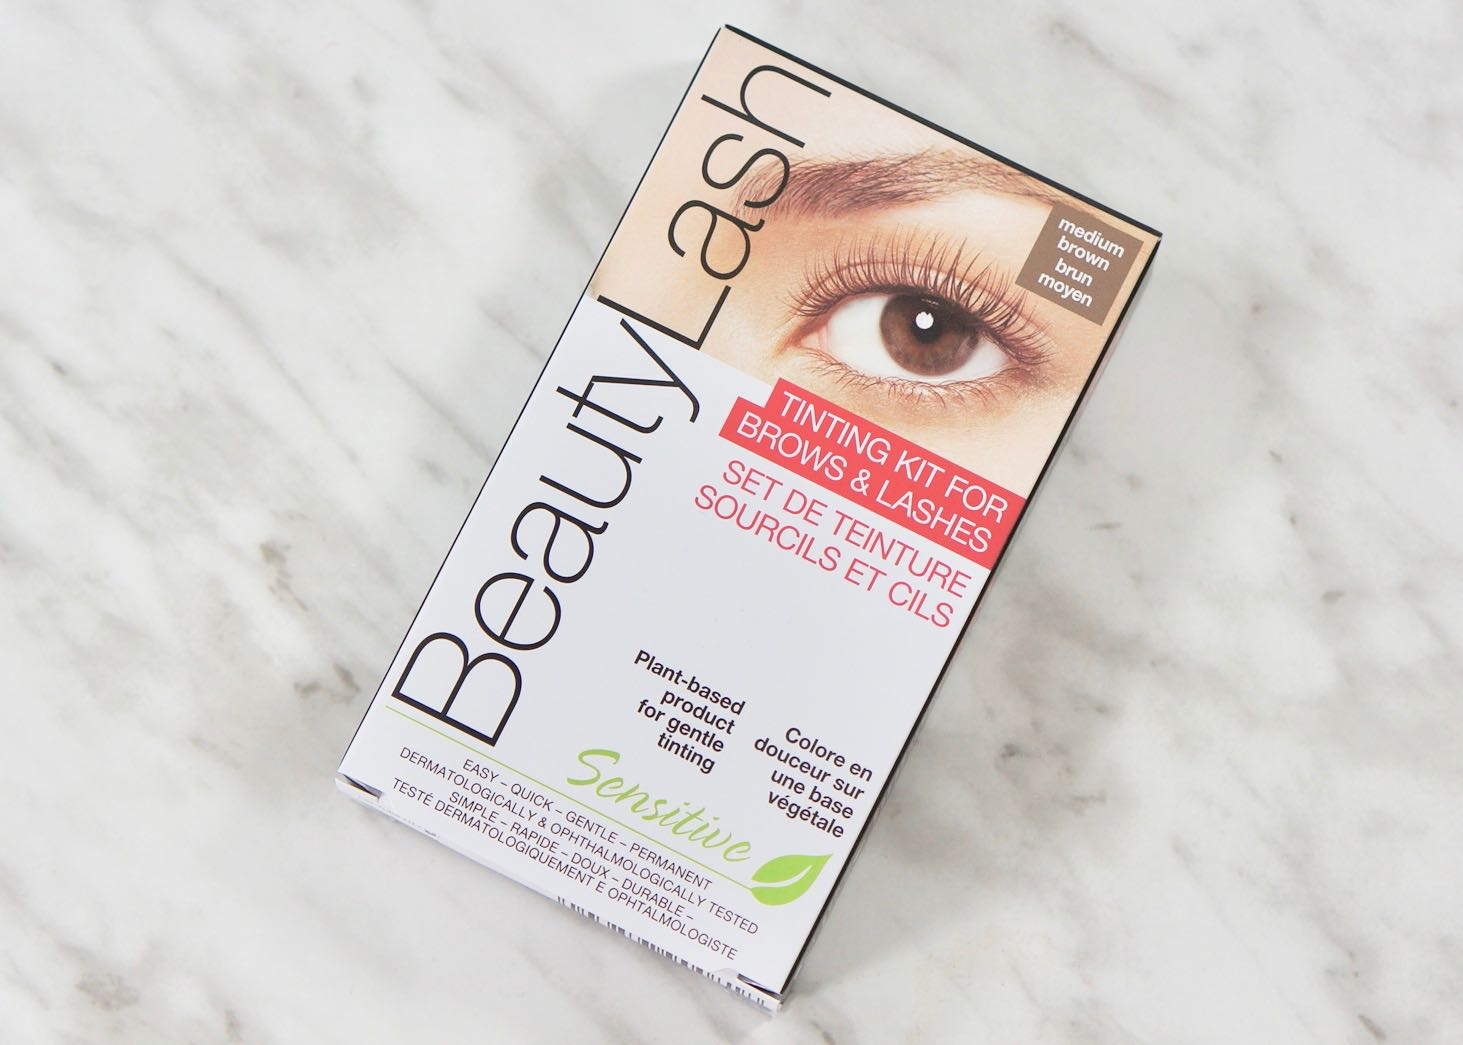 BeautyLash-Brow & Lash Tint KitDSC06578.jpg